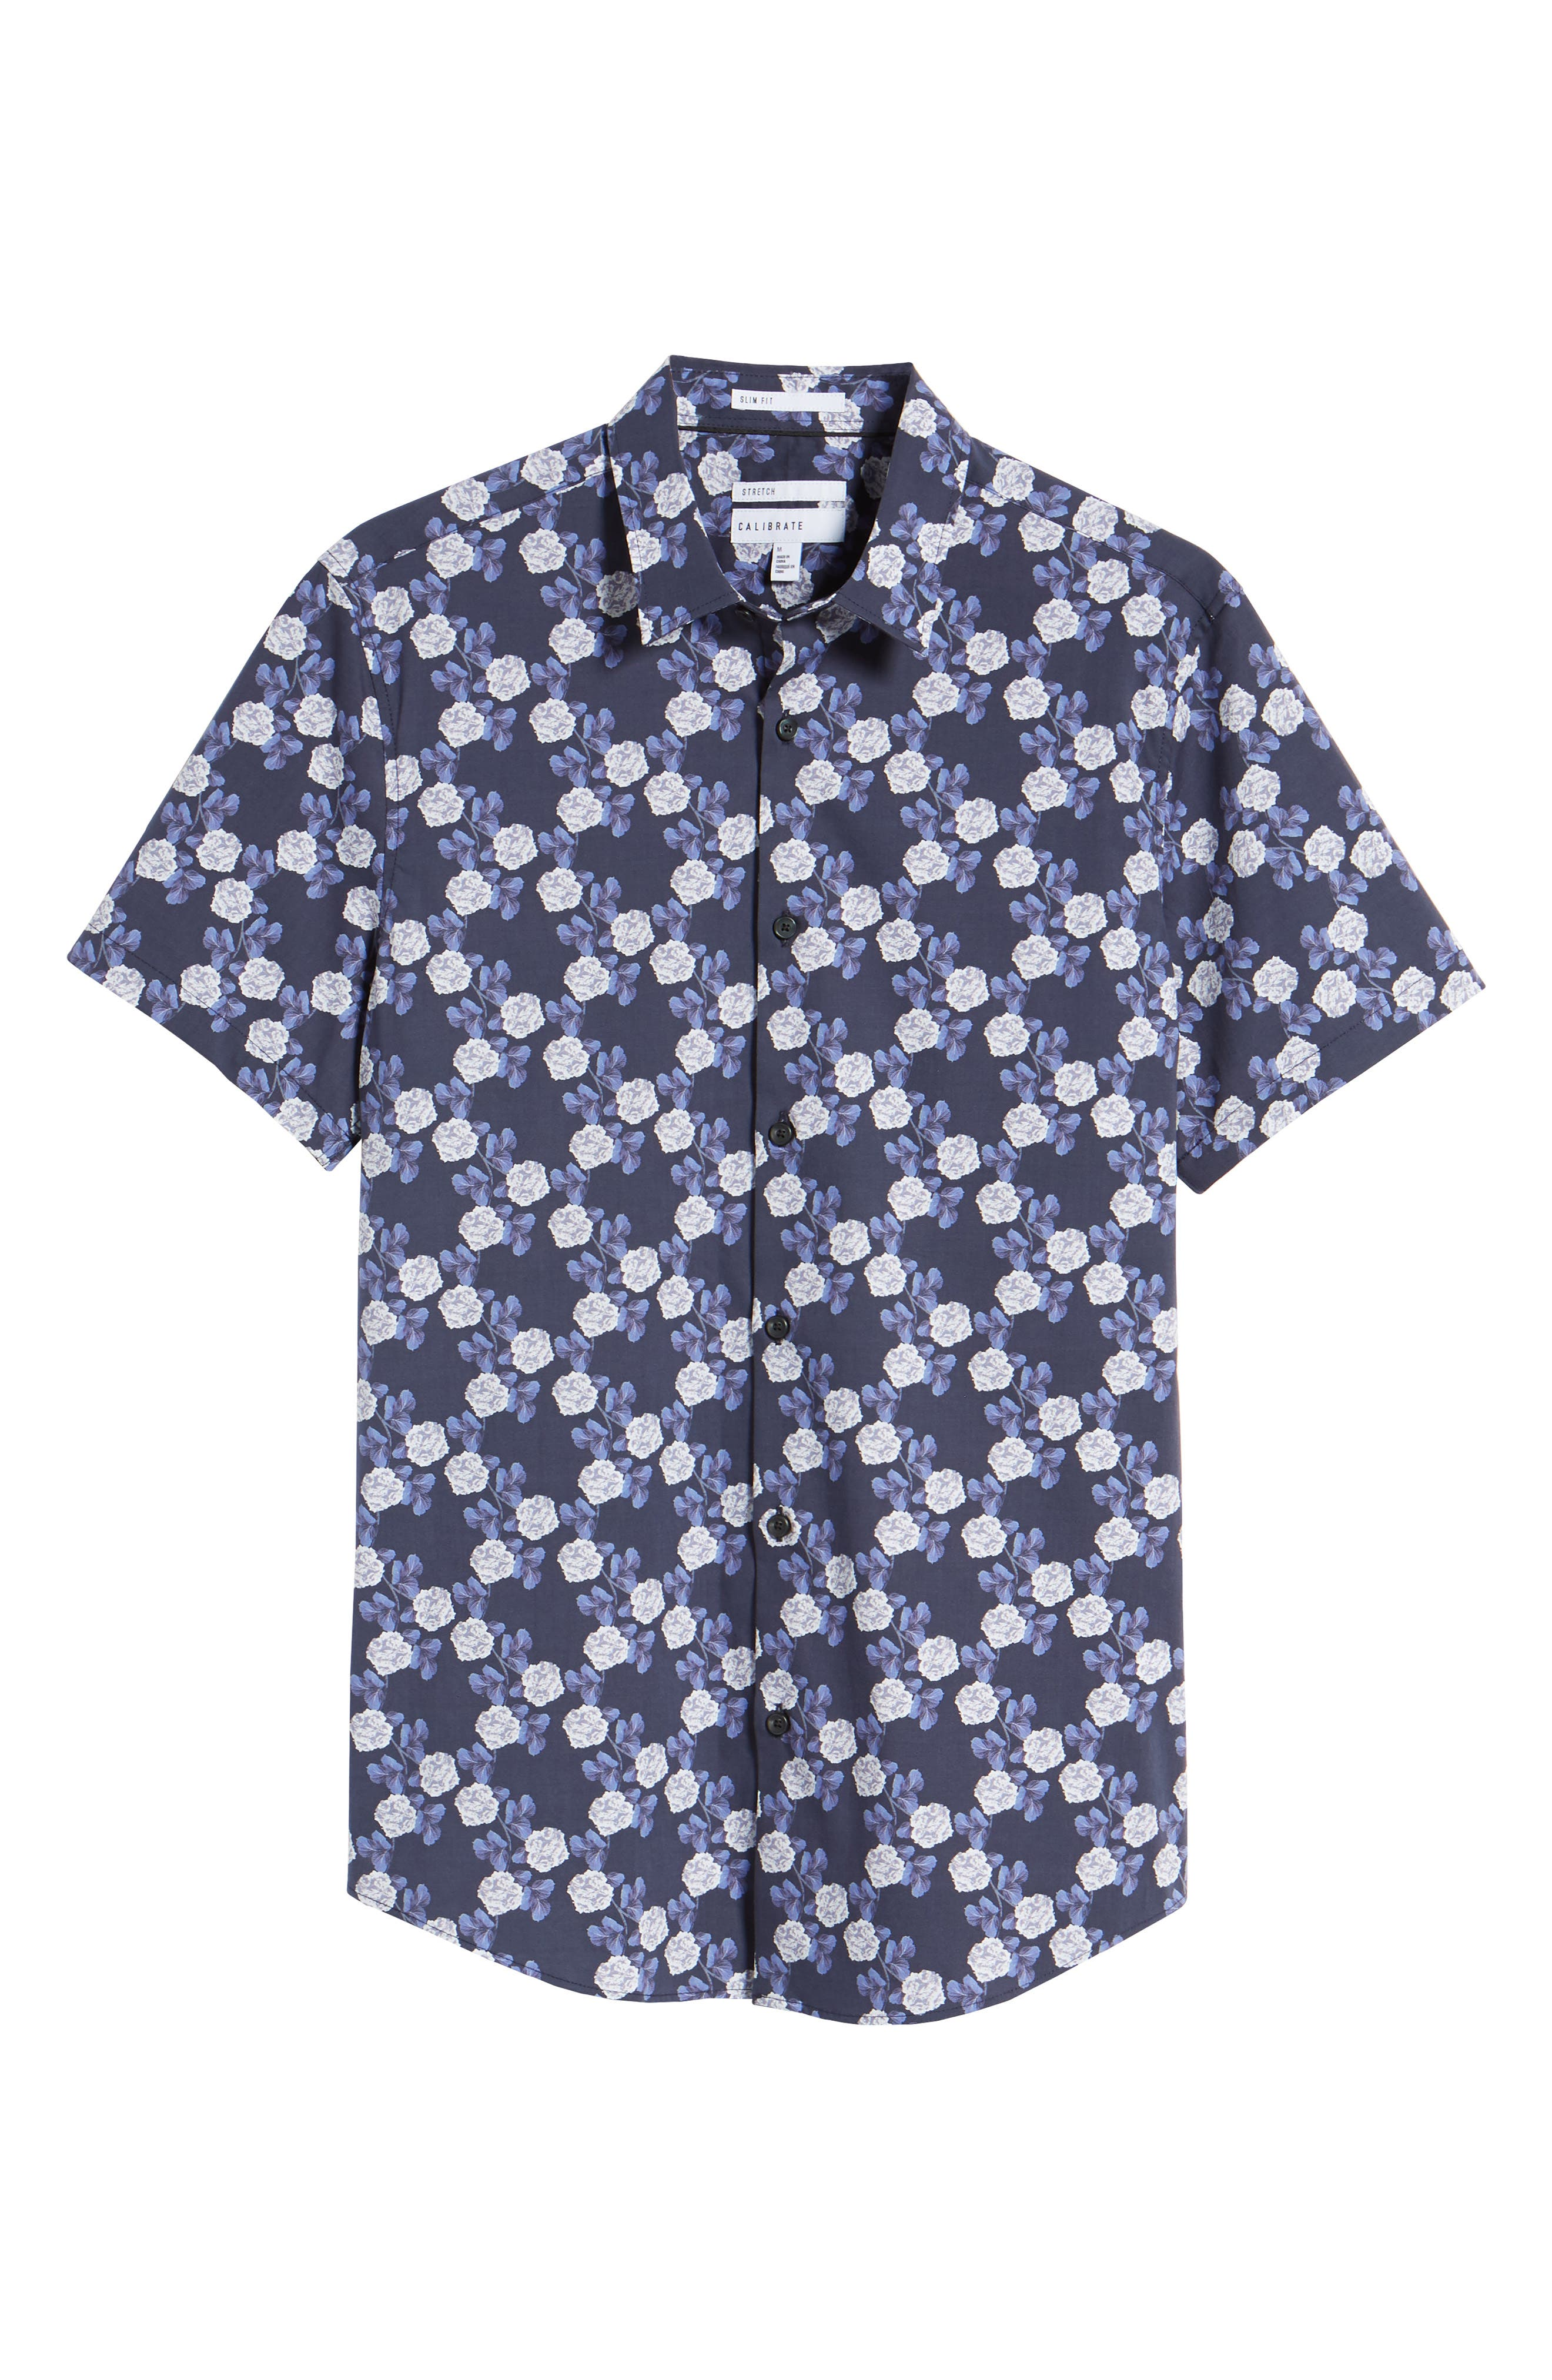 Trim Fit Short Sleeve Sport Shirt,                             Alternate thumbnail 6, color,                             Blue Flower Print